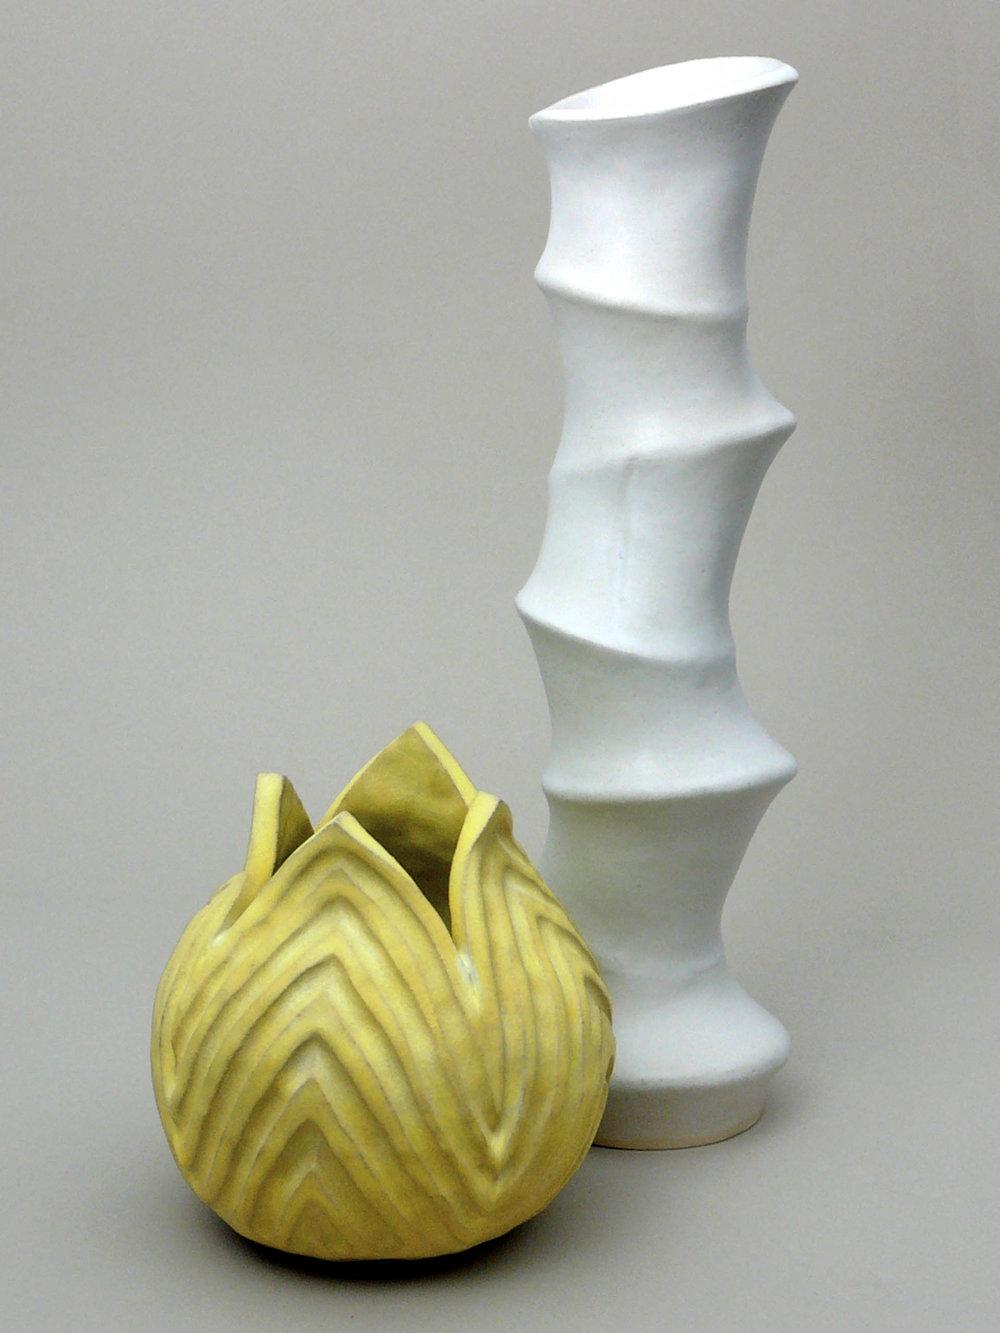 Pod Vase #16 and Rolling Circles Vase #12